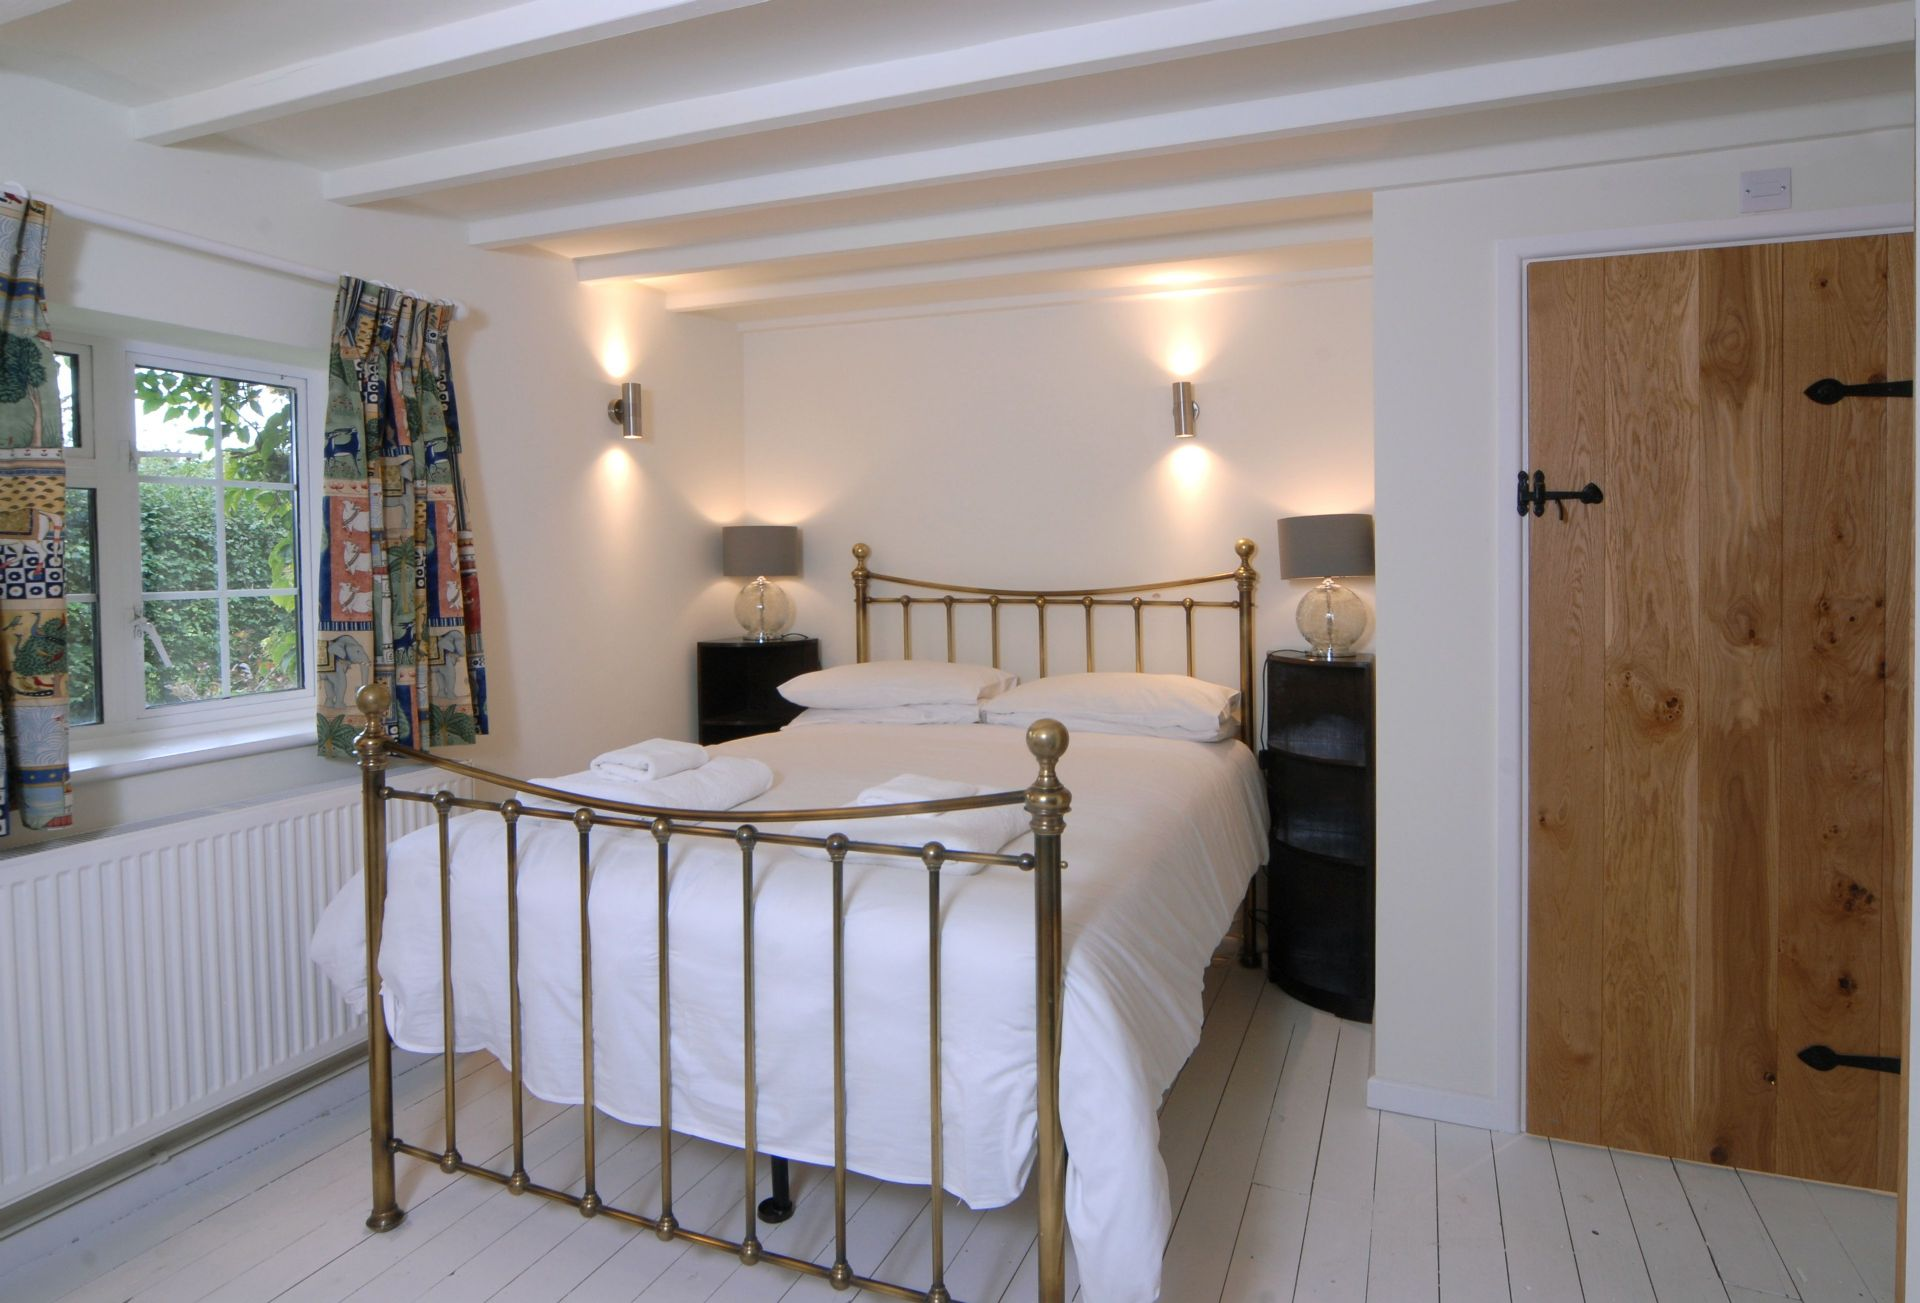 Hiron's Piece: Another Bedroom